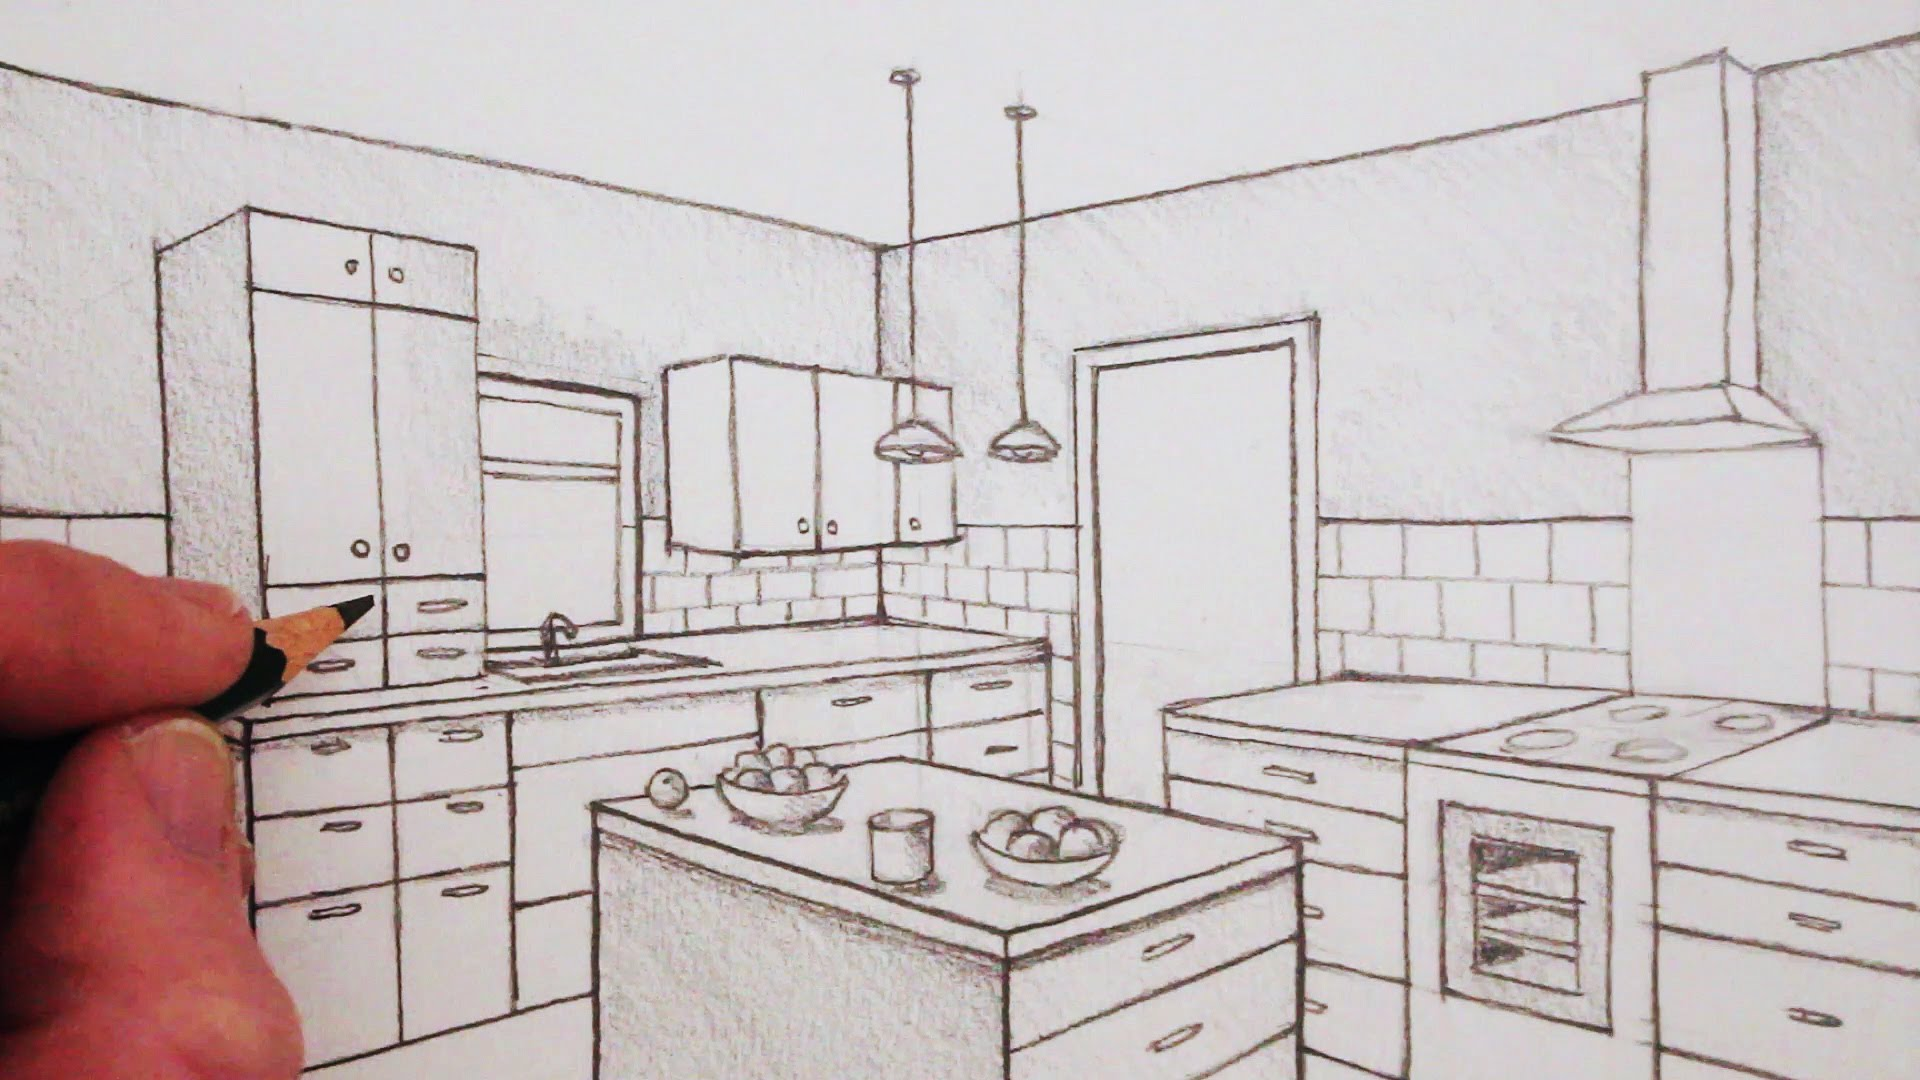 Room Drawing At Getdrawings